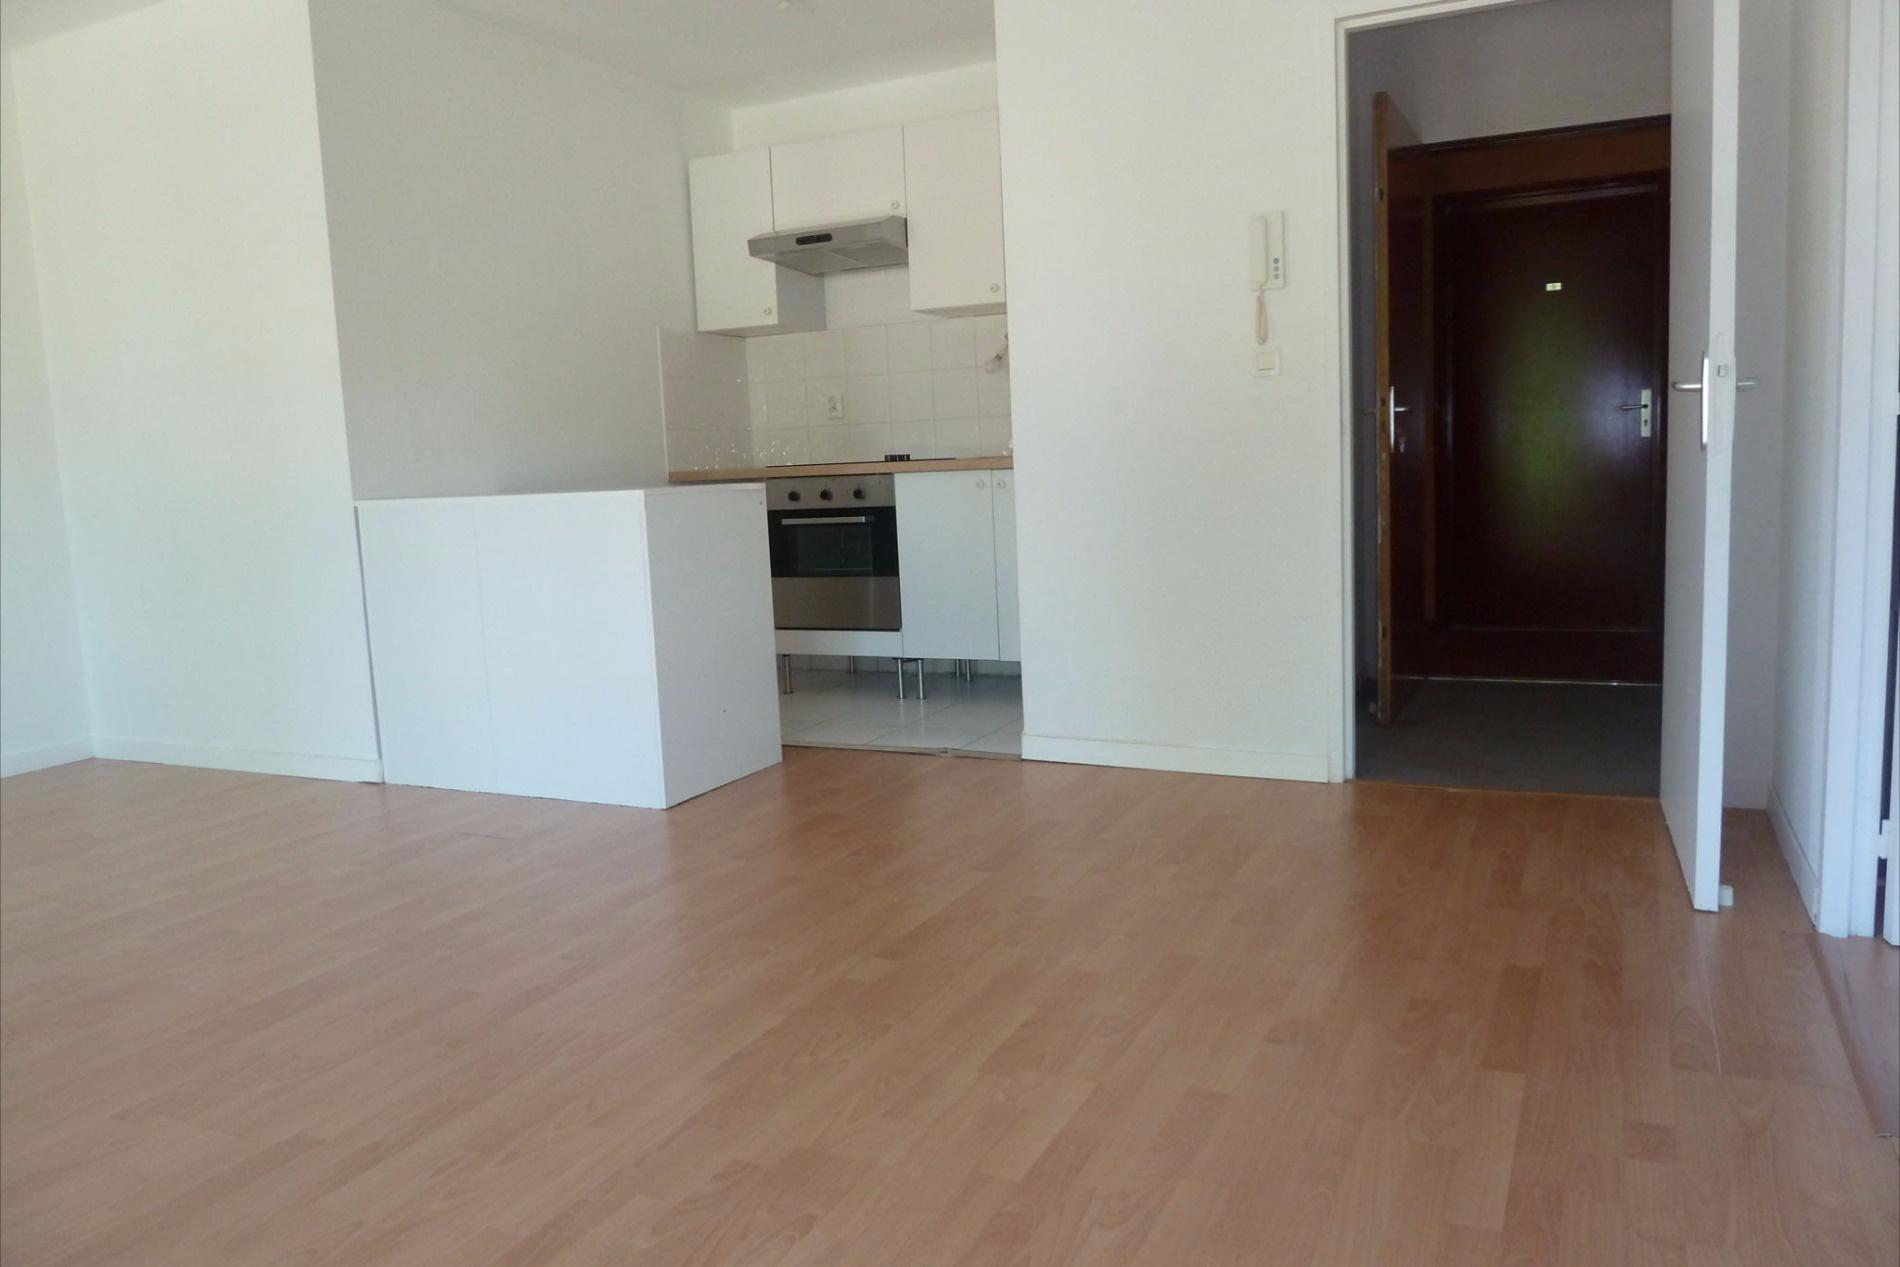 vente appartement mont de marsan 40000 elyade immobilier. Black Bedroom Furniture Sets. Home Design Ideas